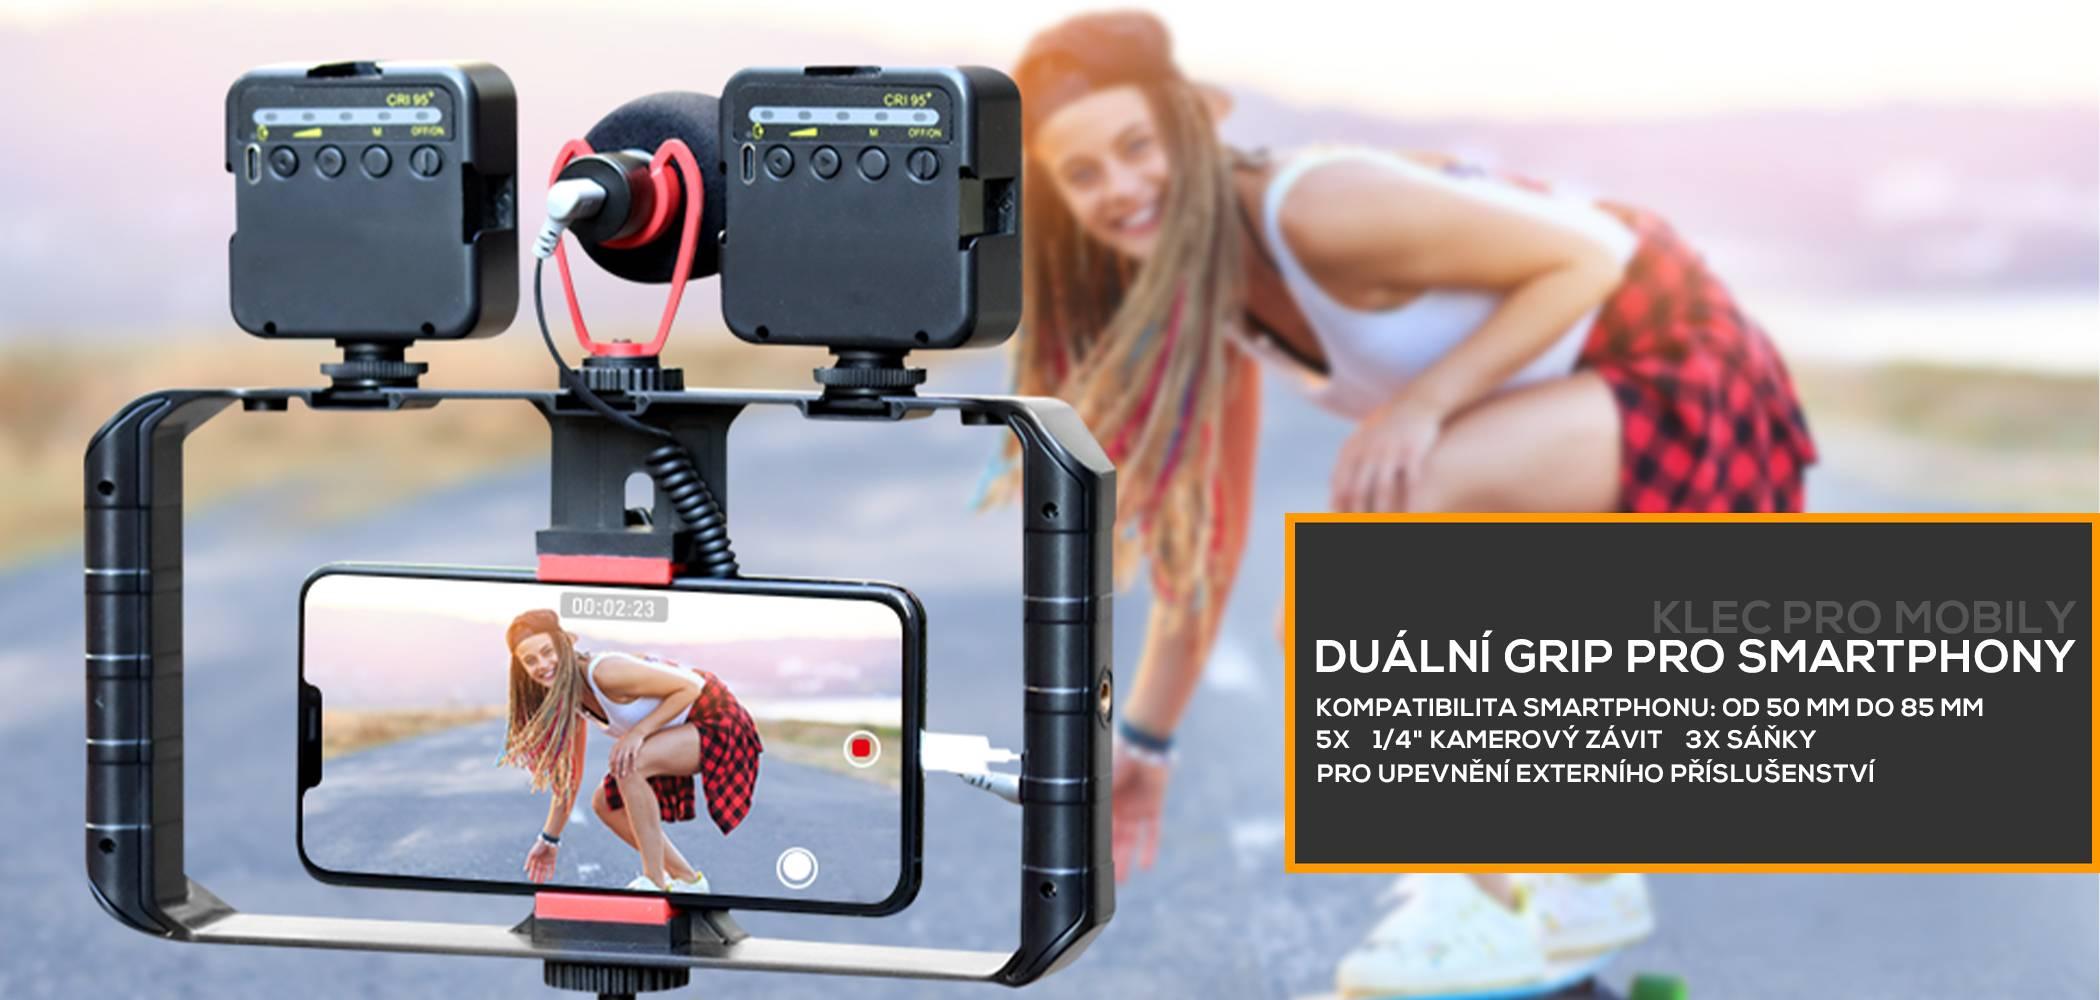 film-technika-ulanzi-u-rig-pro-galerie-banner2